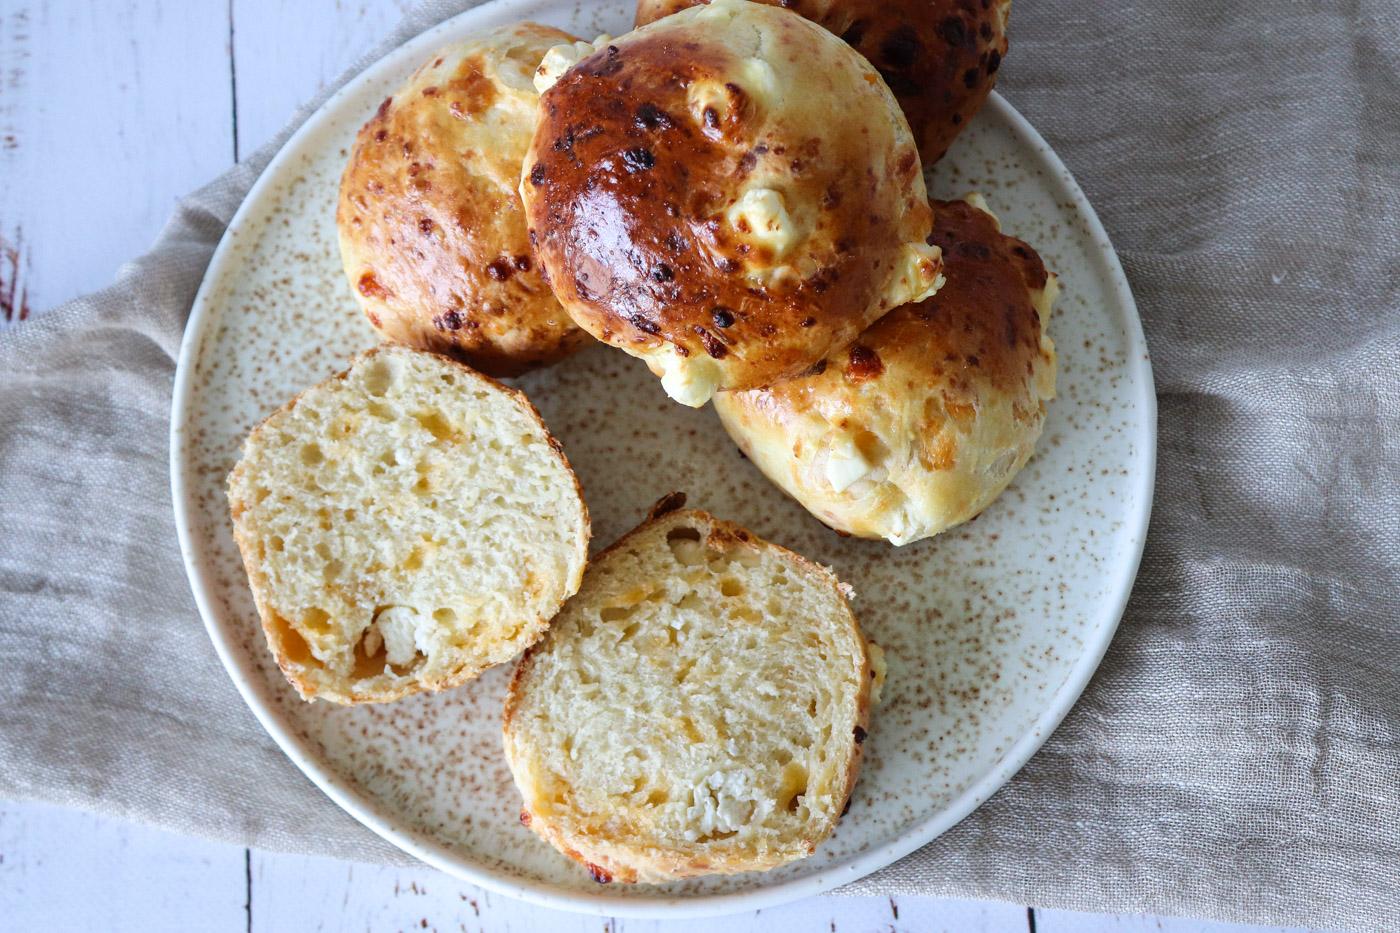 De Bedste Osteboller – Boller Med Cheddar, Mozzarella Og Feta – Perfekt Til Sandwiches